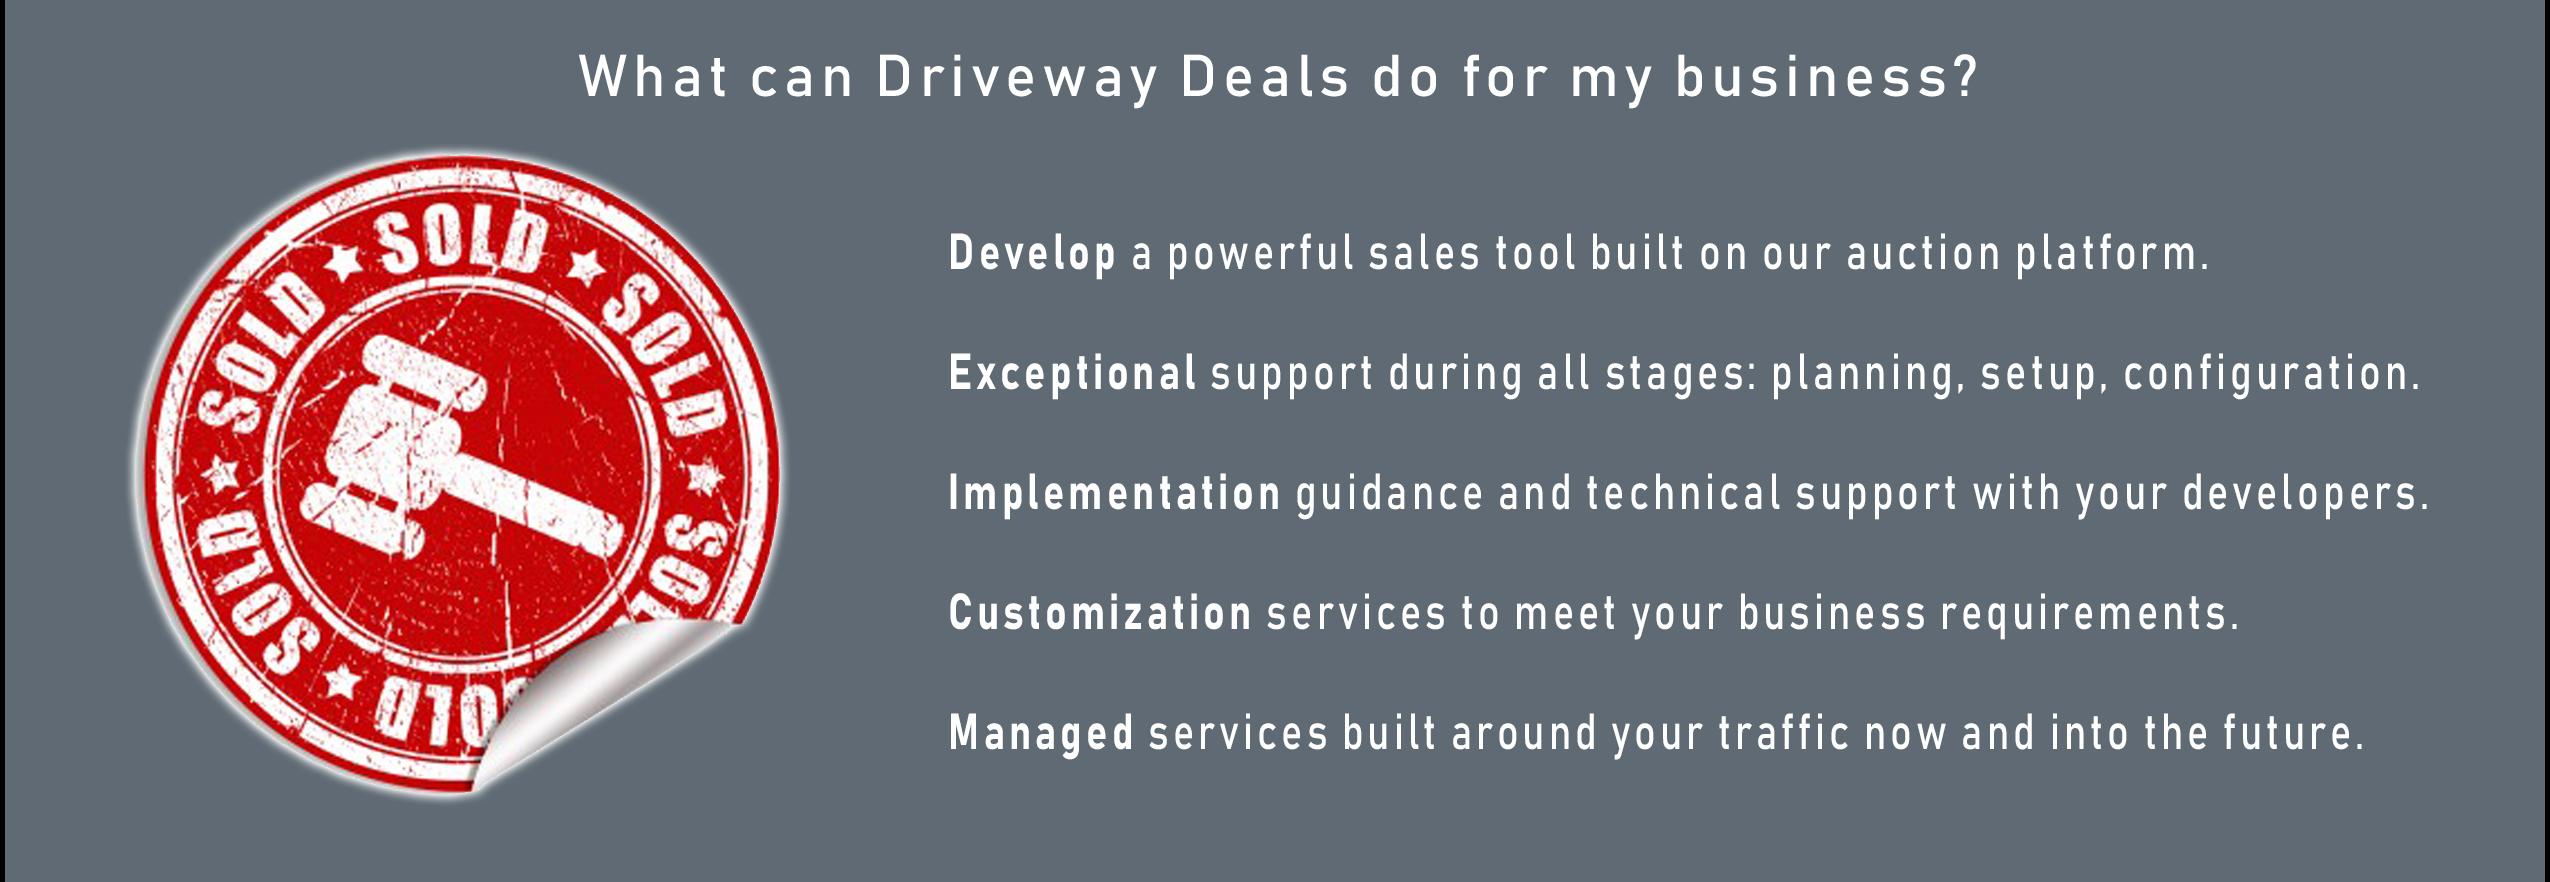 Driveway Deals Business